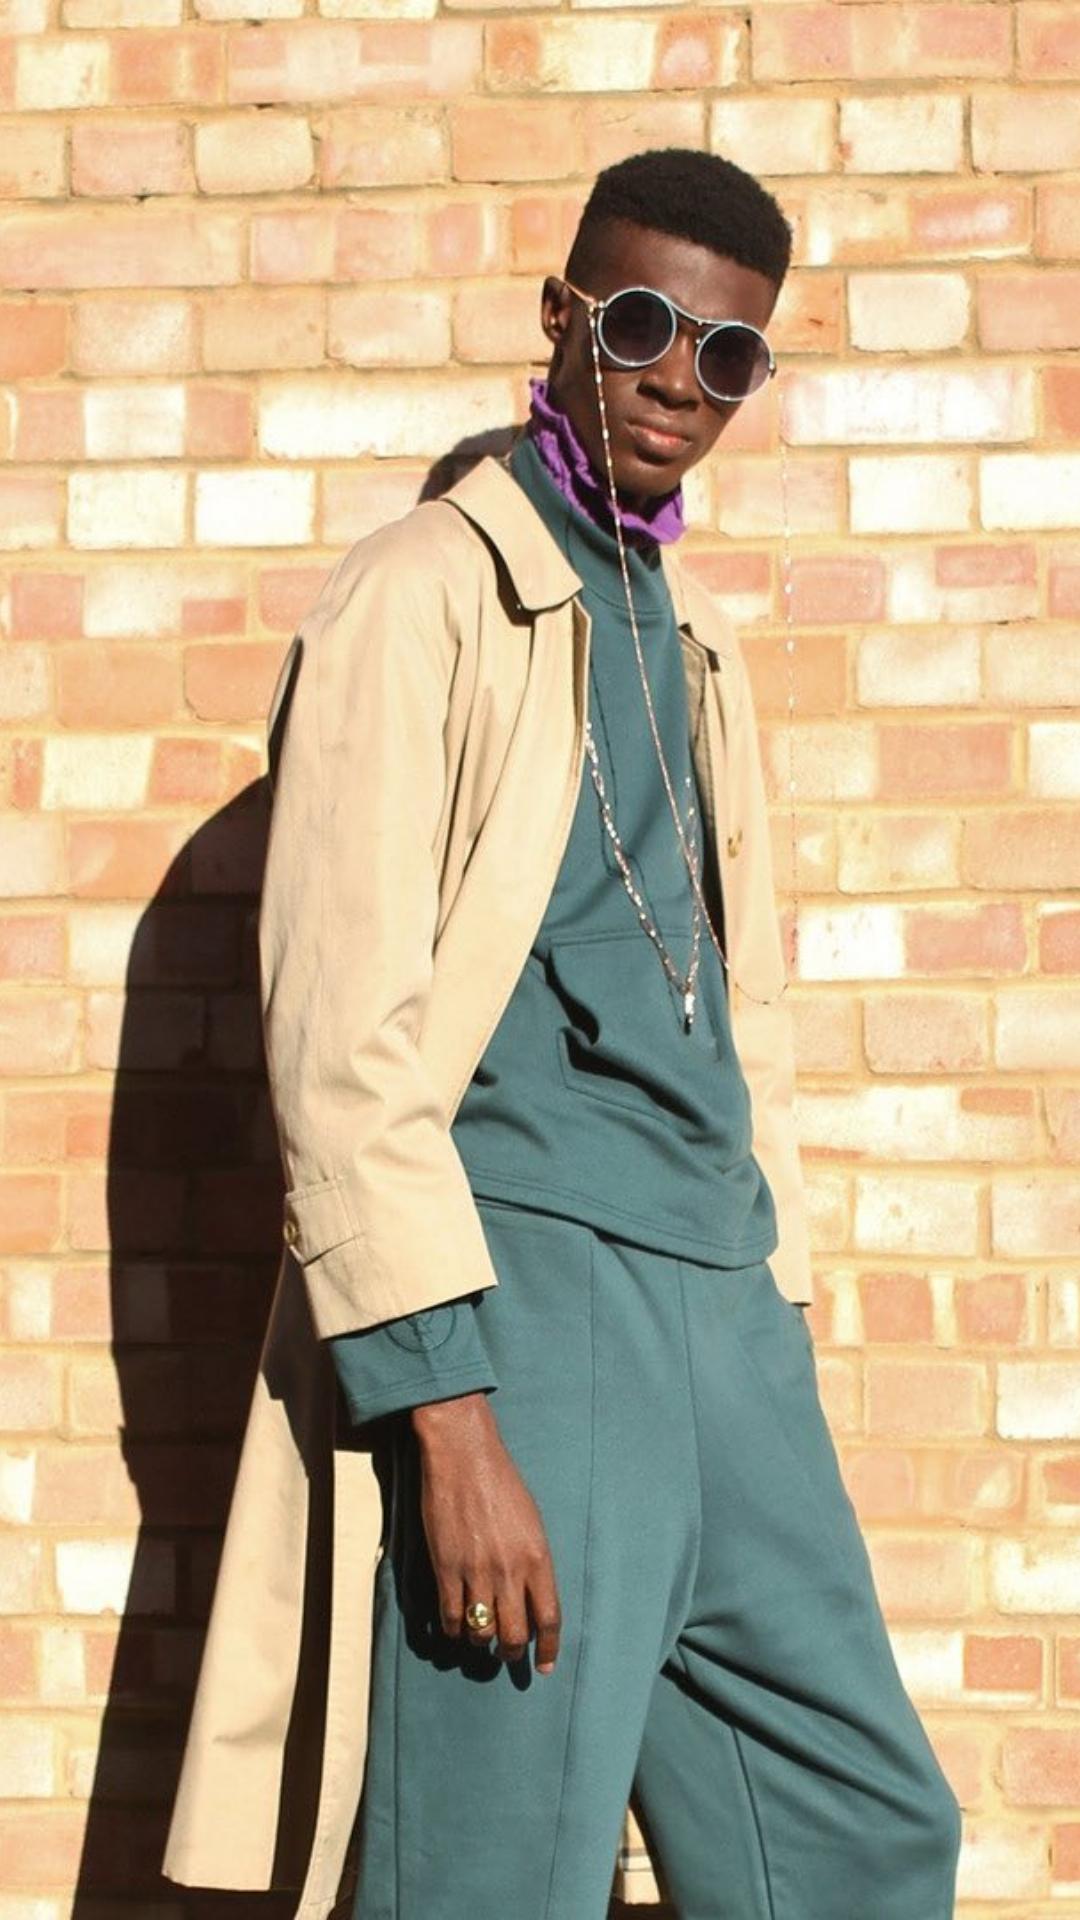 Eos Black - Sunglasses, Chain & Leather Case